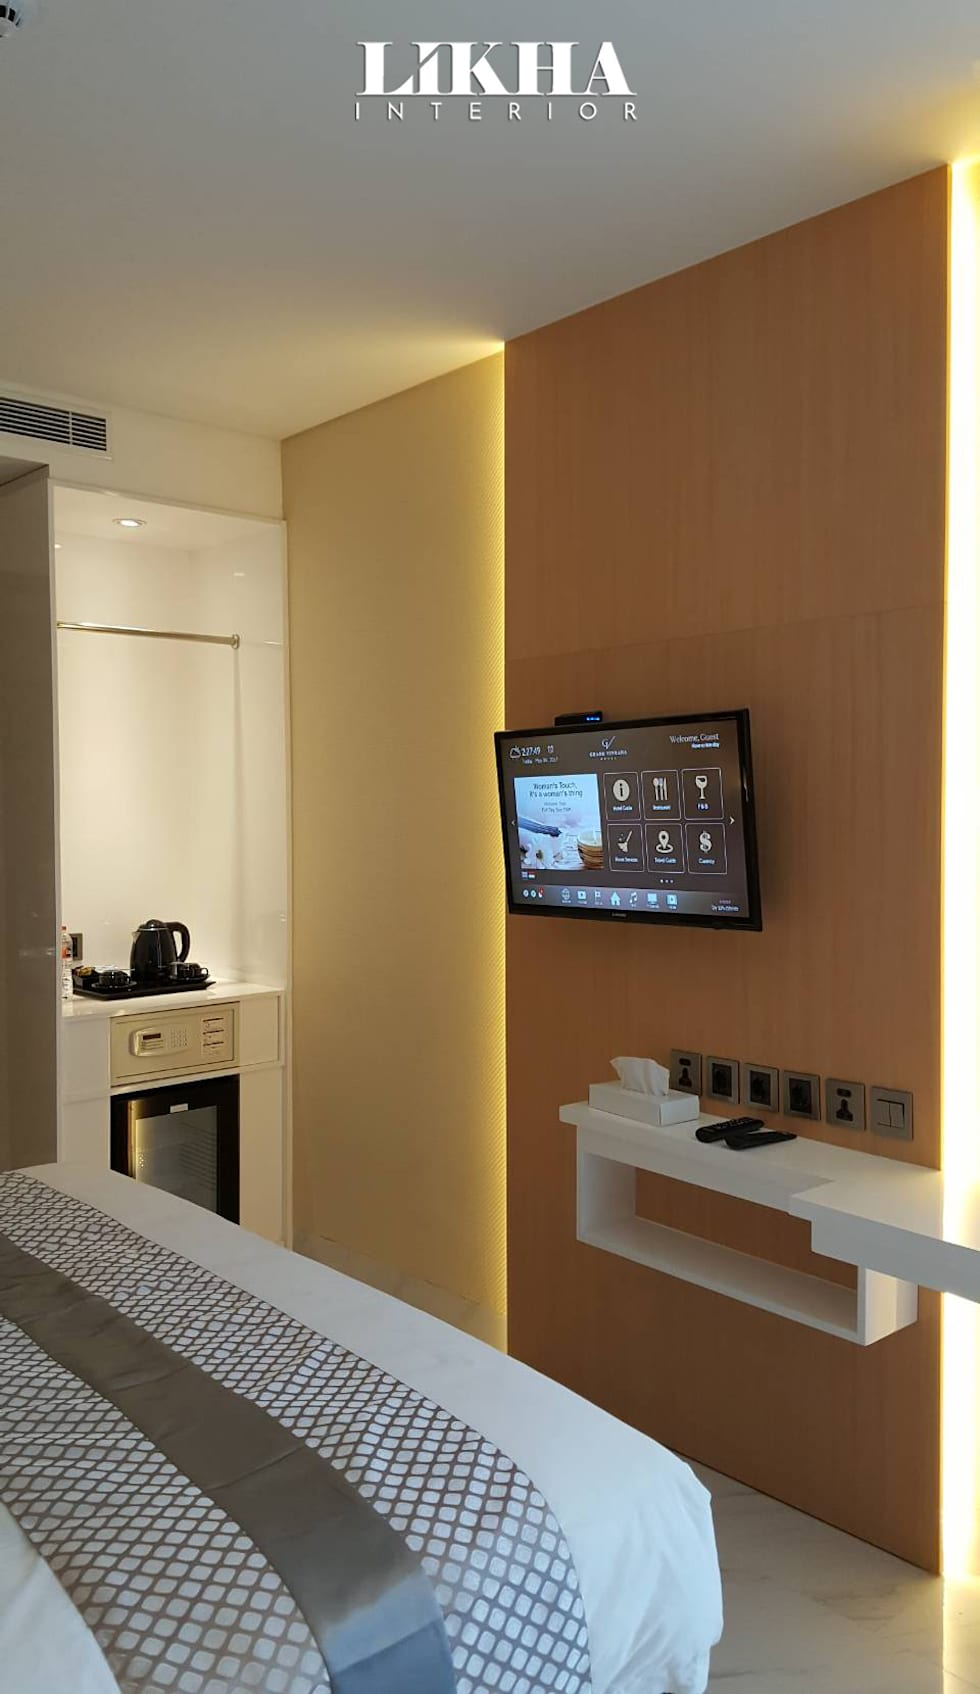 Kabinet TV:  Hotels by Likha Interior